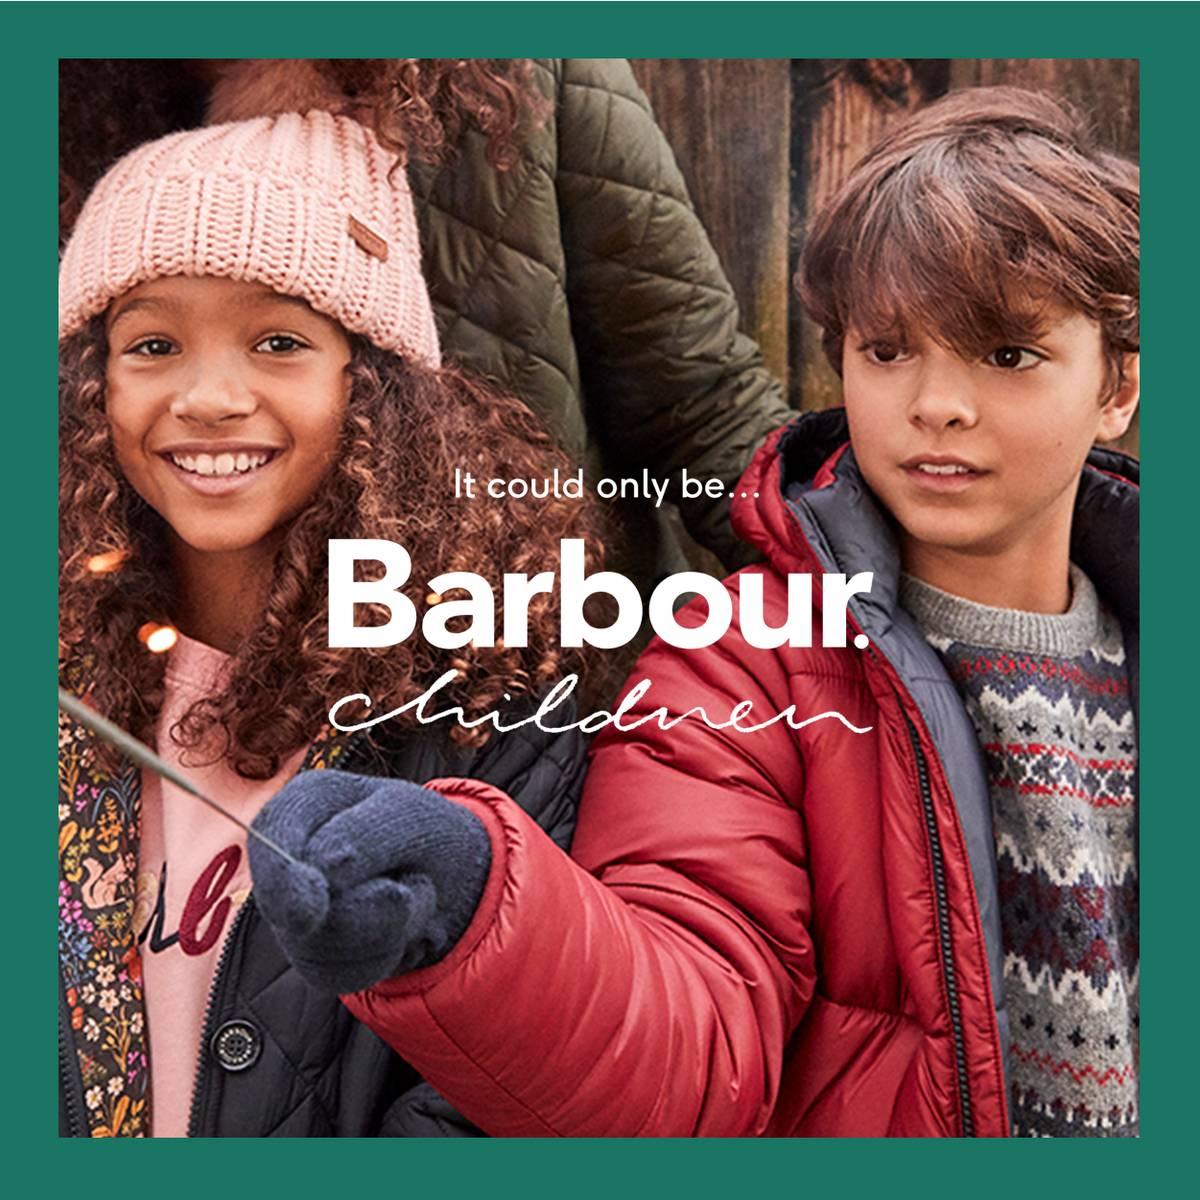 Barbour kids Bonfire Night edit